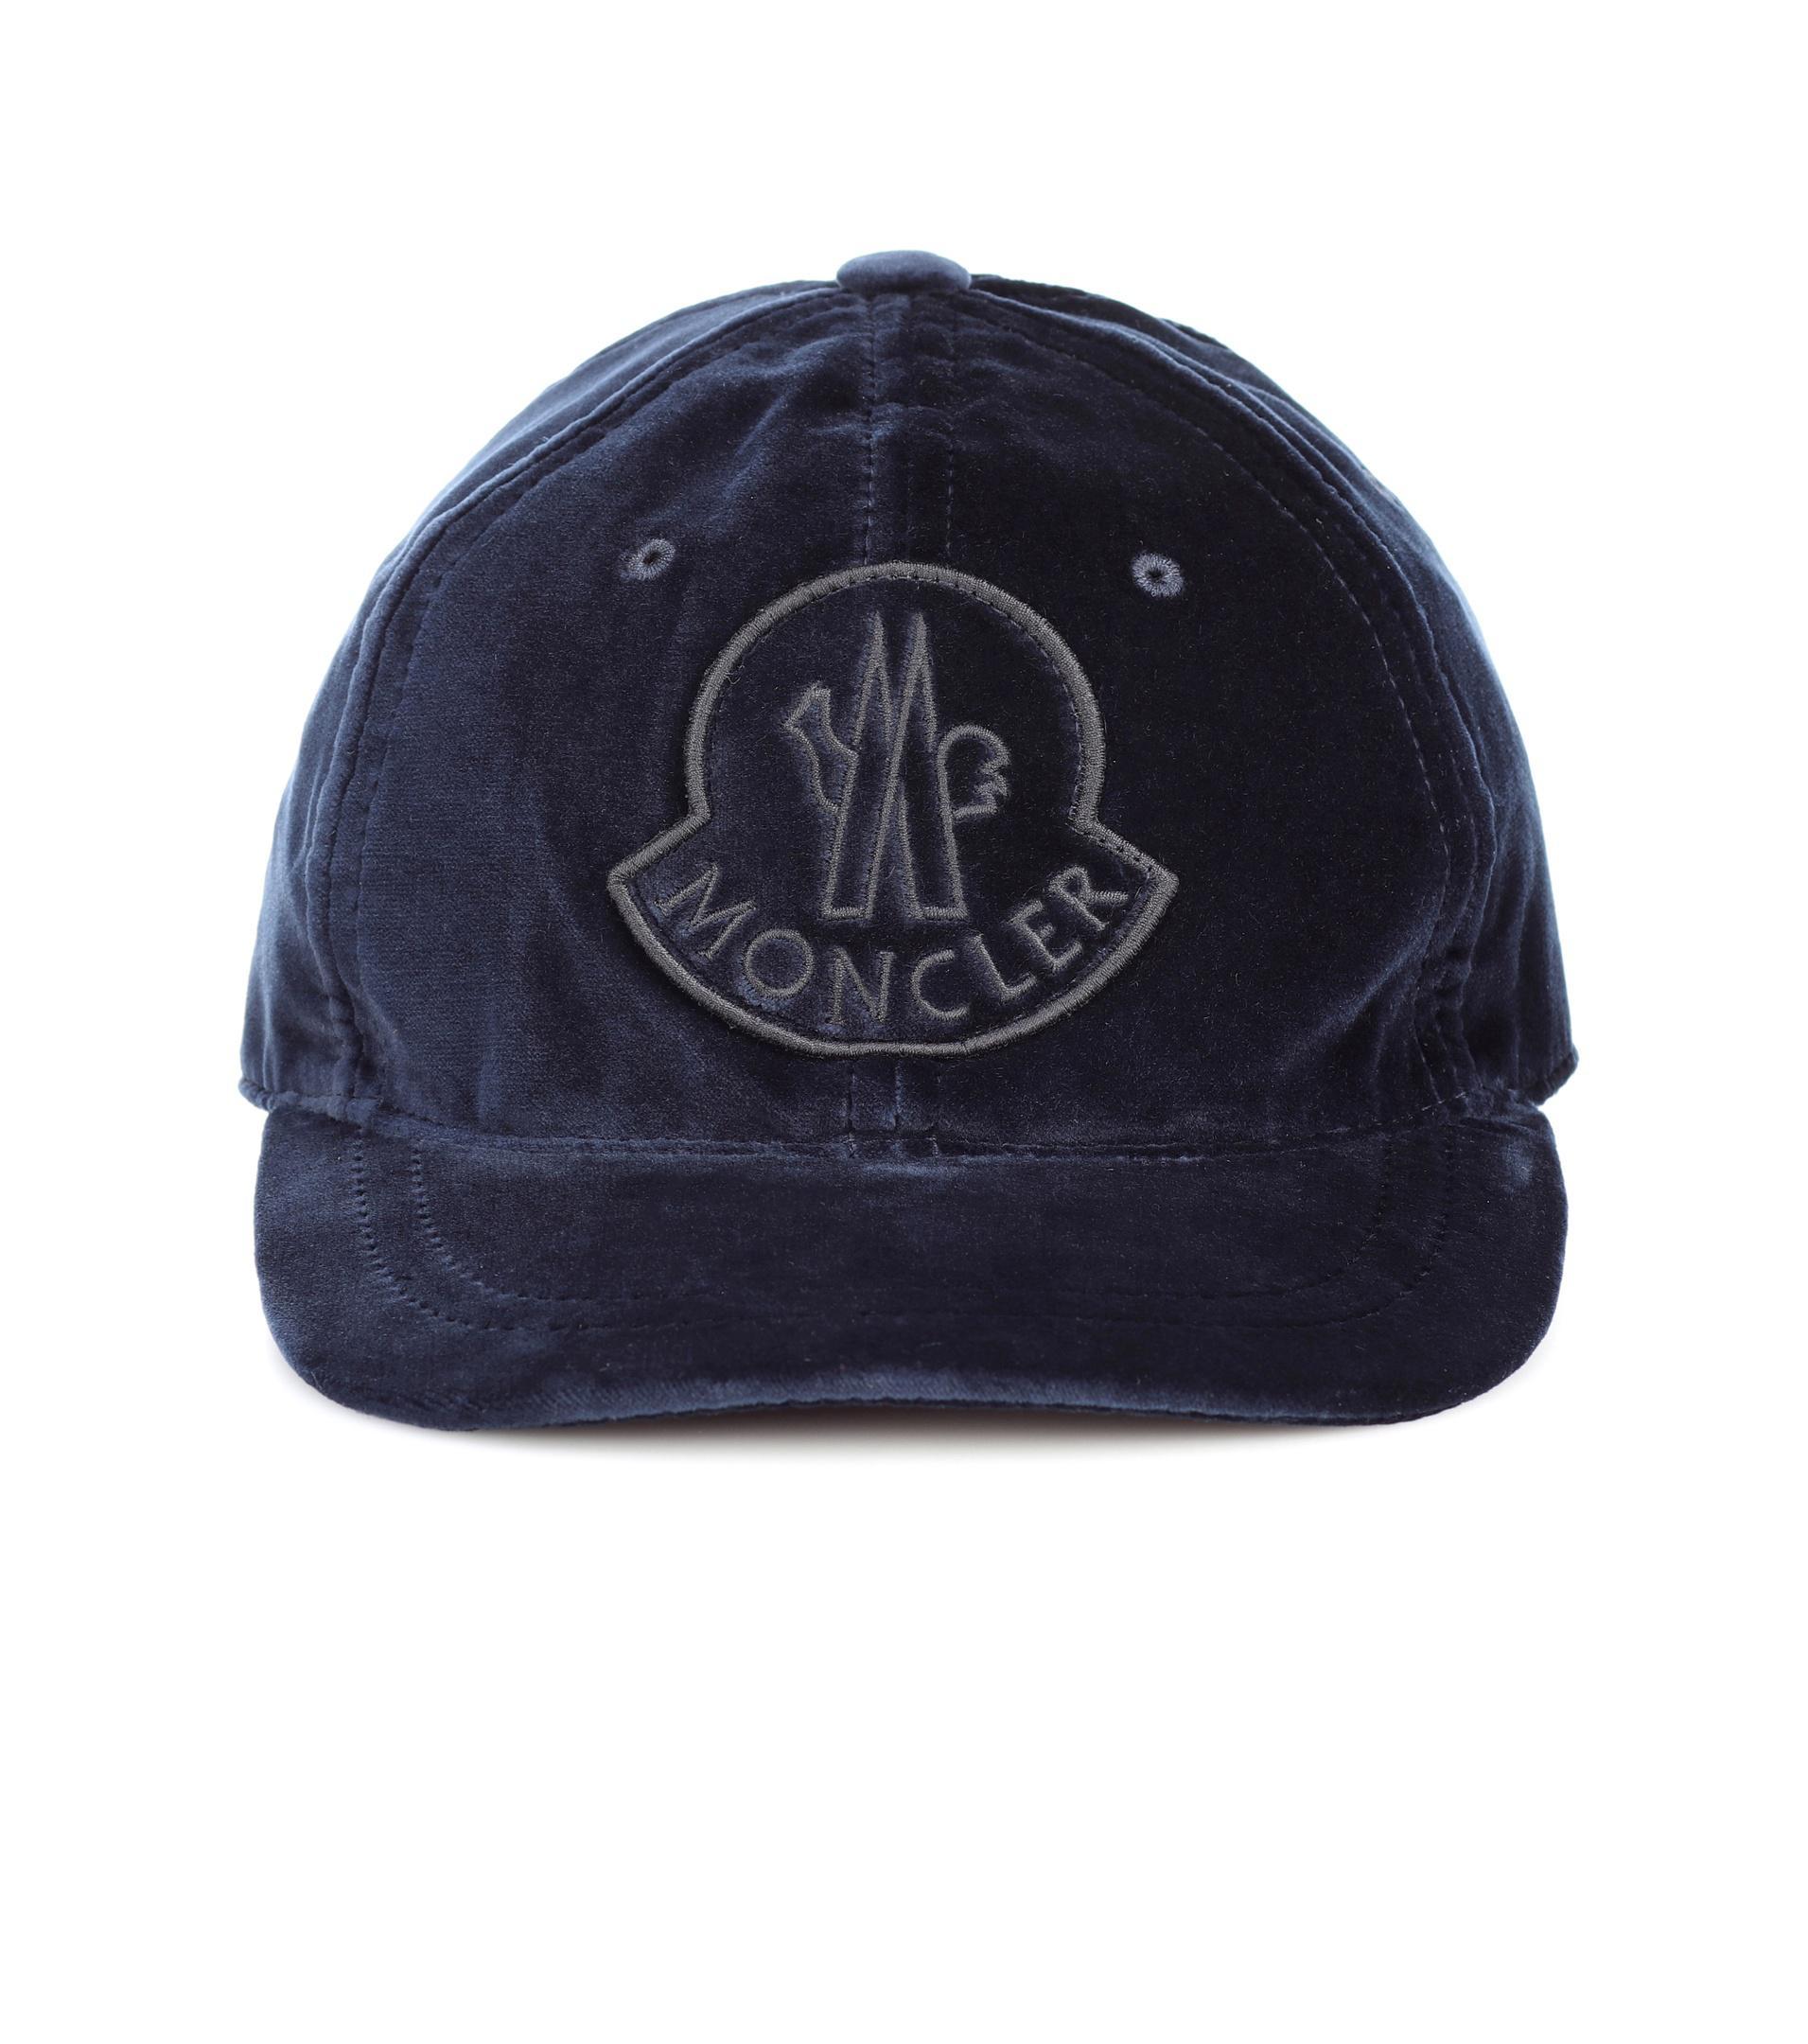 debab4dd09b Moncler Velvet Cap in Blue - Lyst